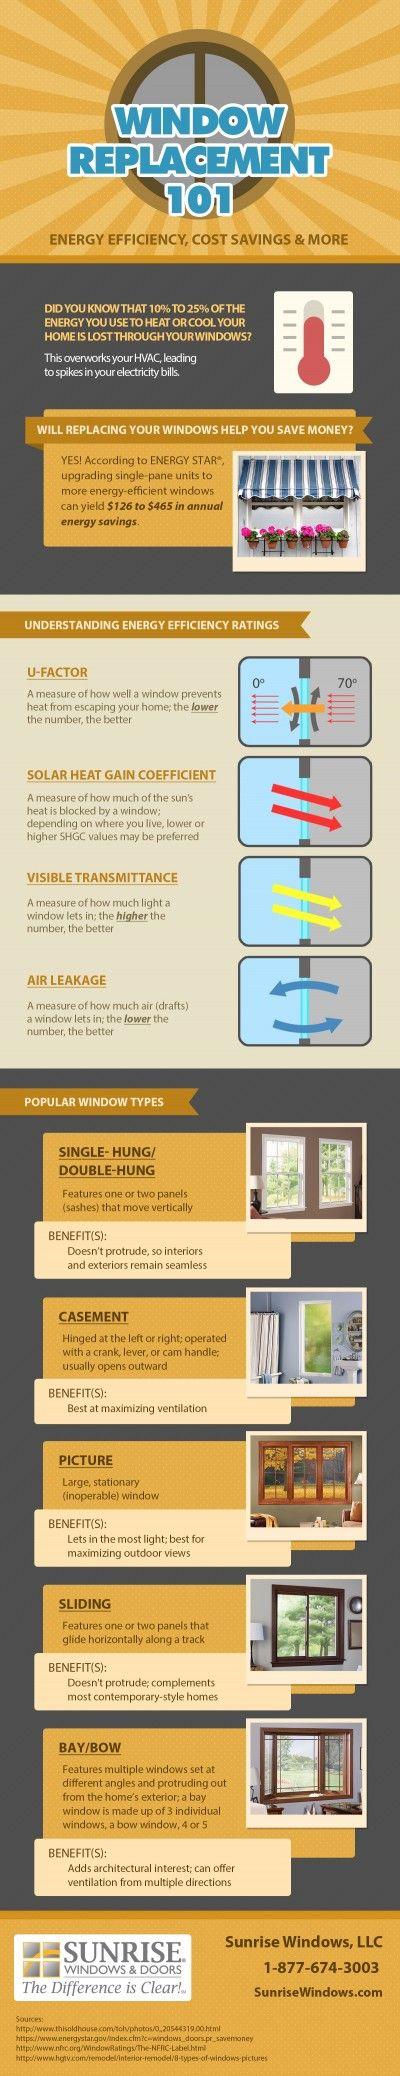 Window Replacement 101 Energy Efficiency